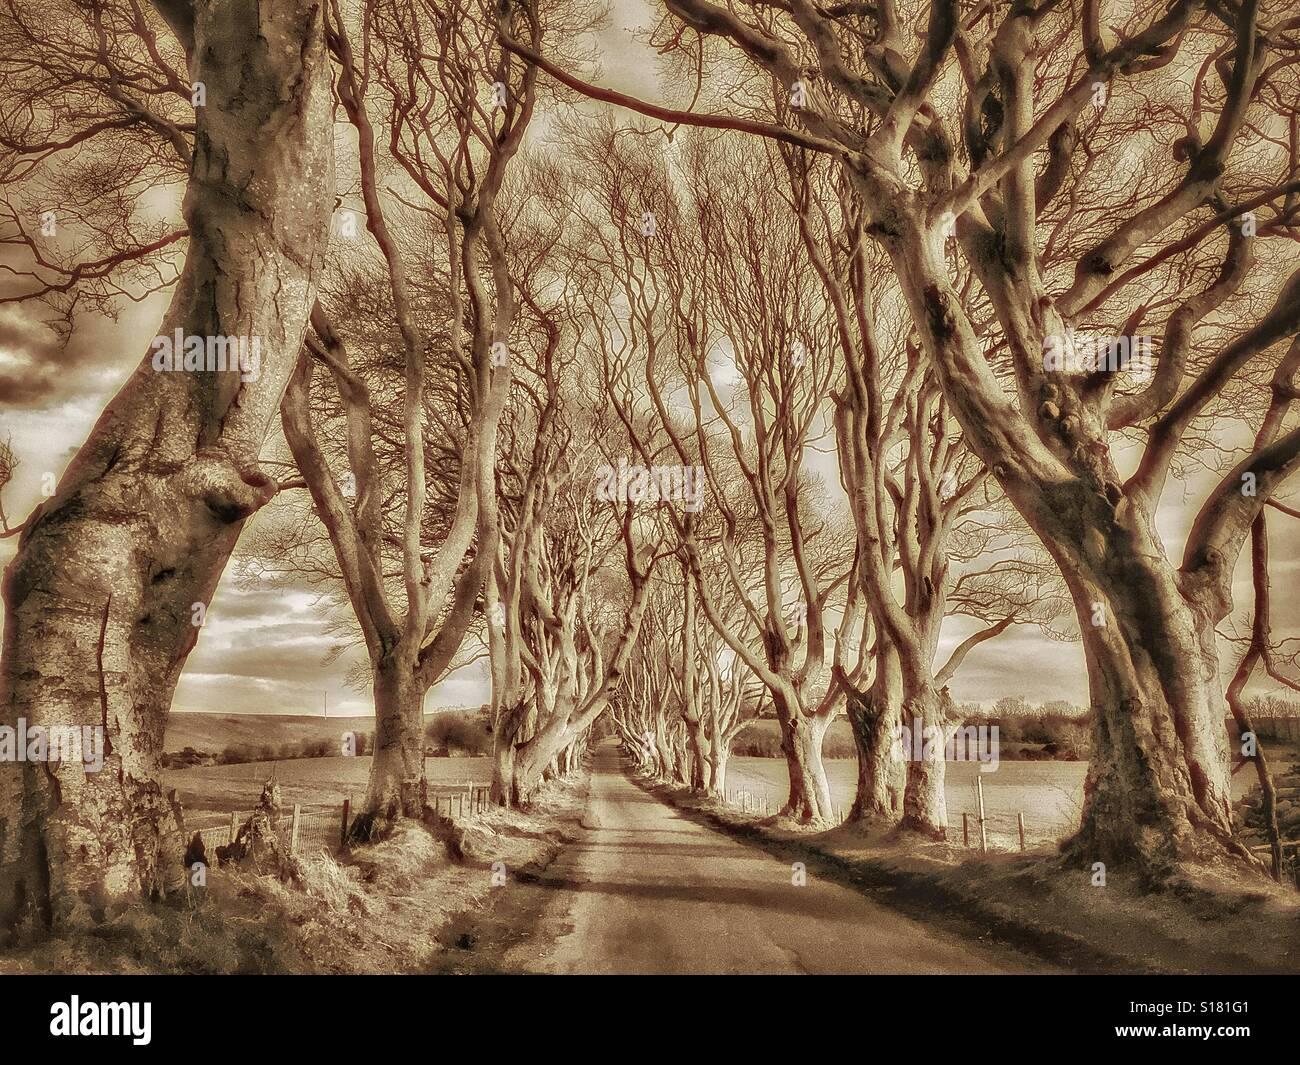 """THE DARK HEDGES"" - An Avenue of 18th Century Beech Trees near Ballymoney in Co. Antrim, Northern Ireland. ThisStock Photo"